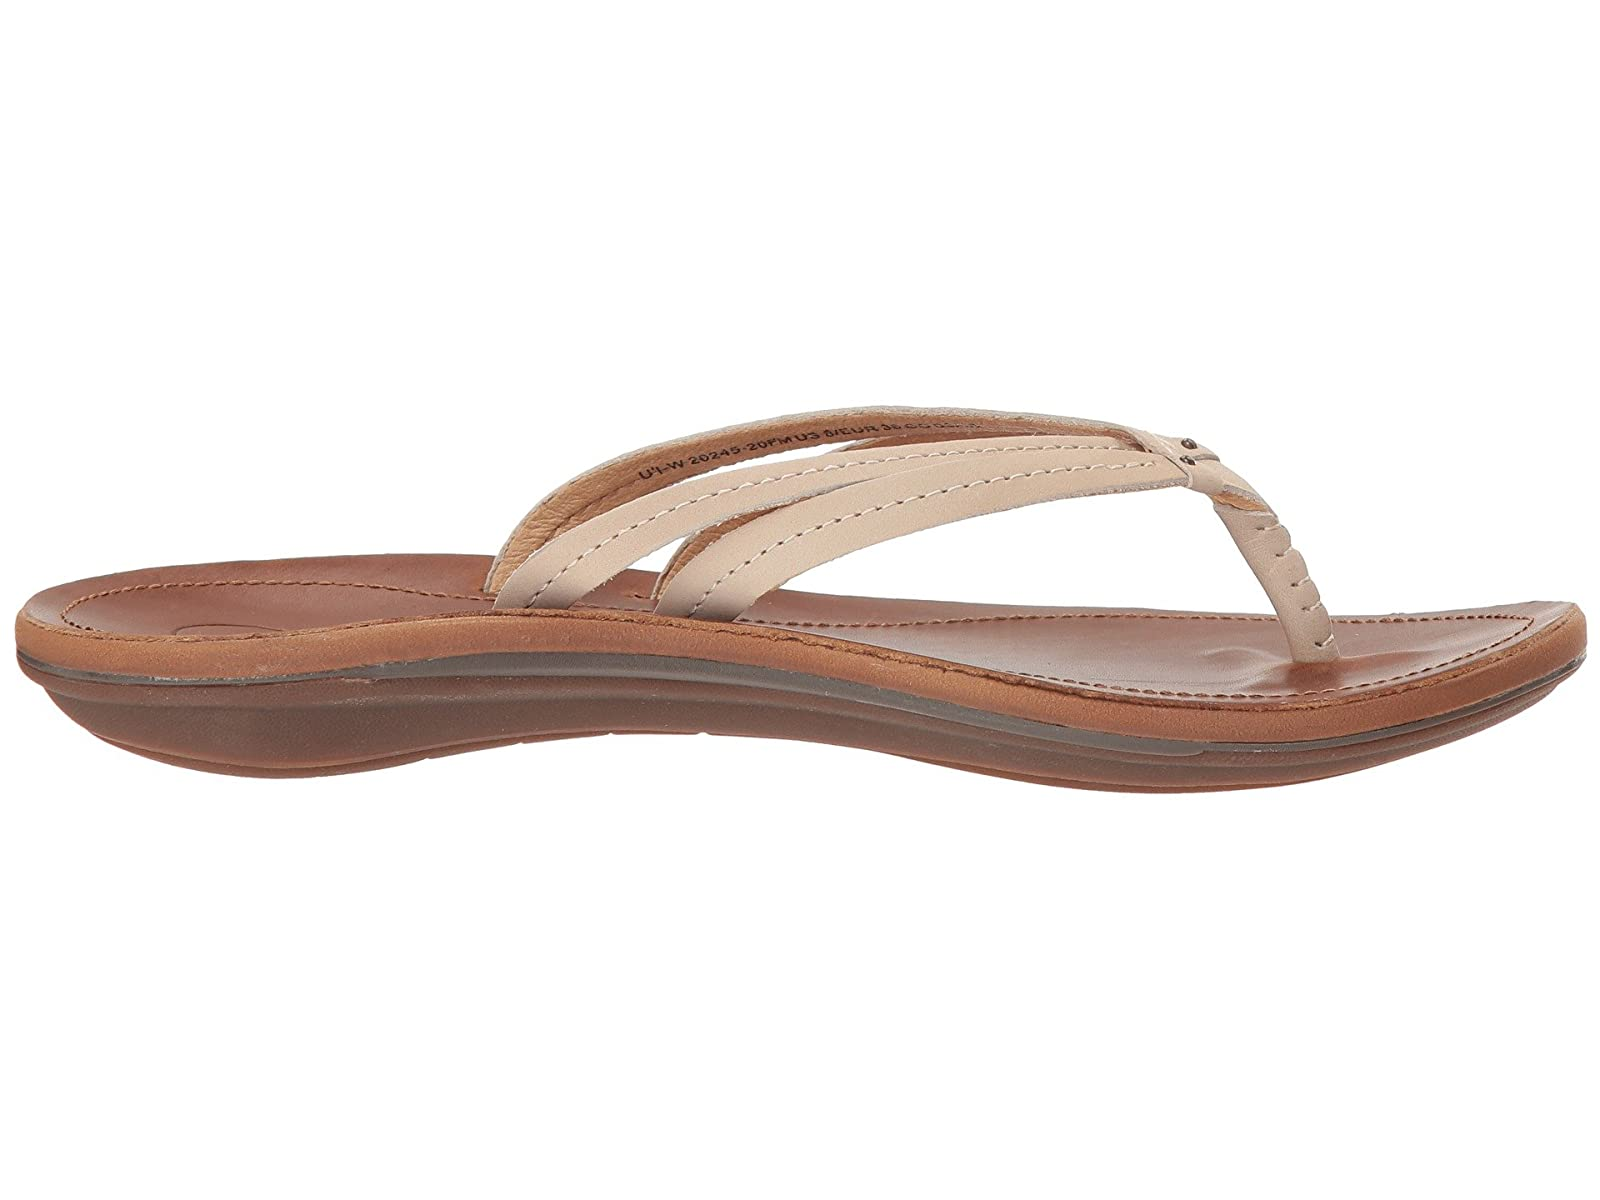 Man/Woman Men's/Women's OluKai U'i   List of tidal shoes   Trendy f6f316